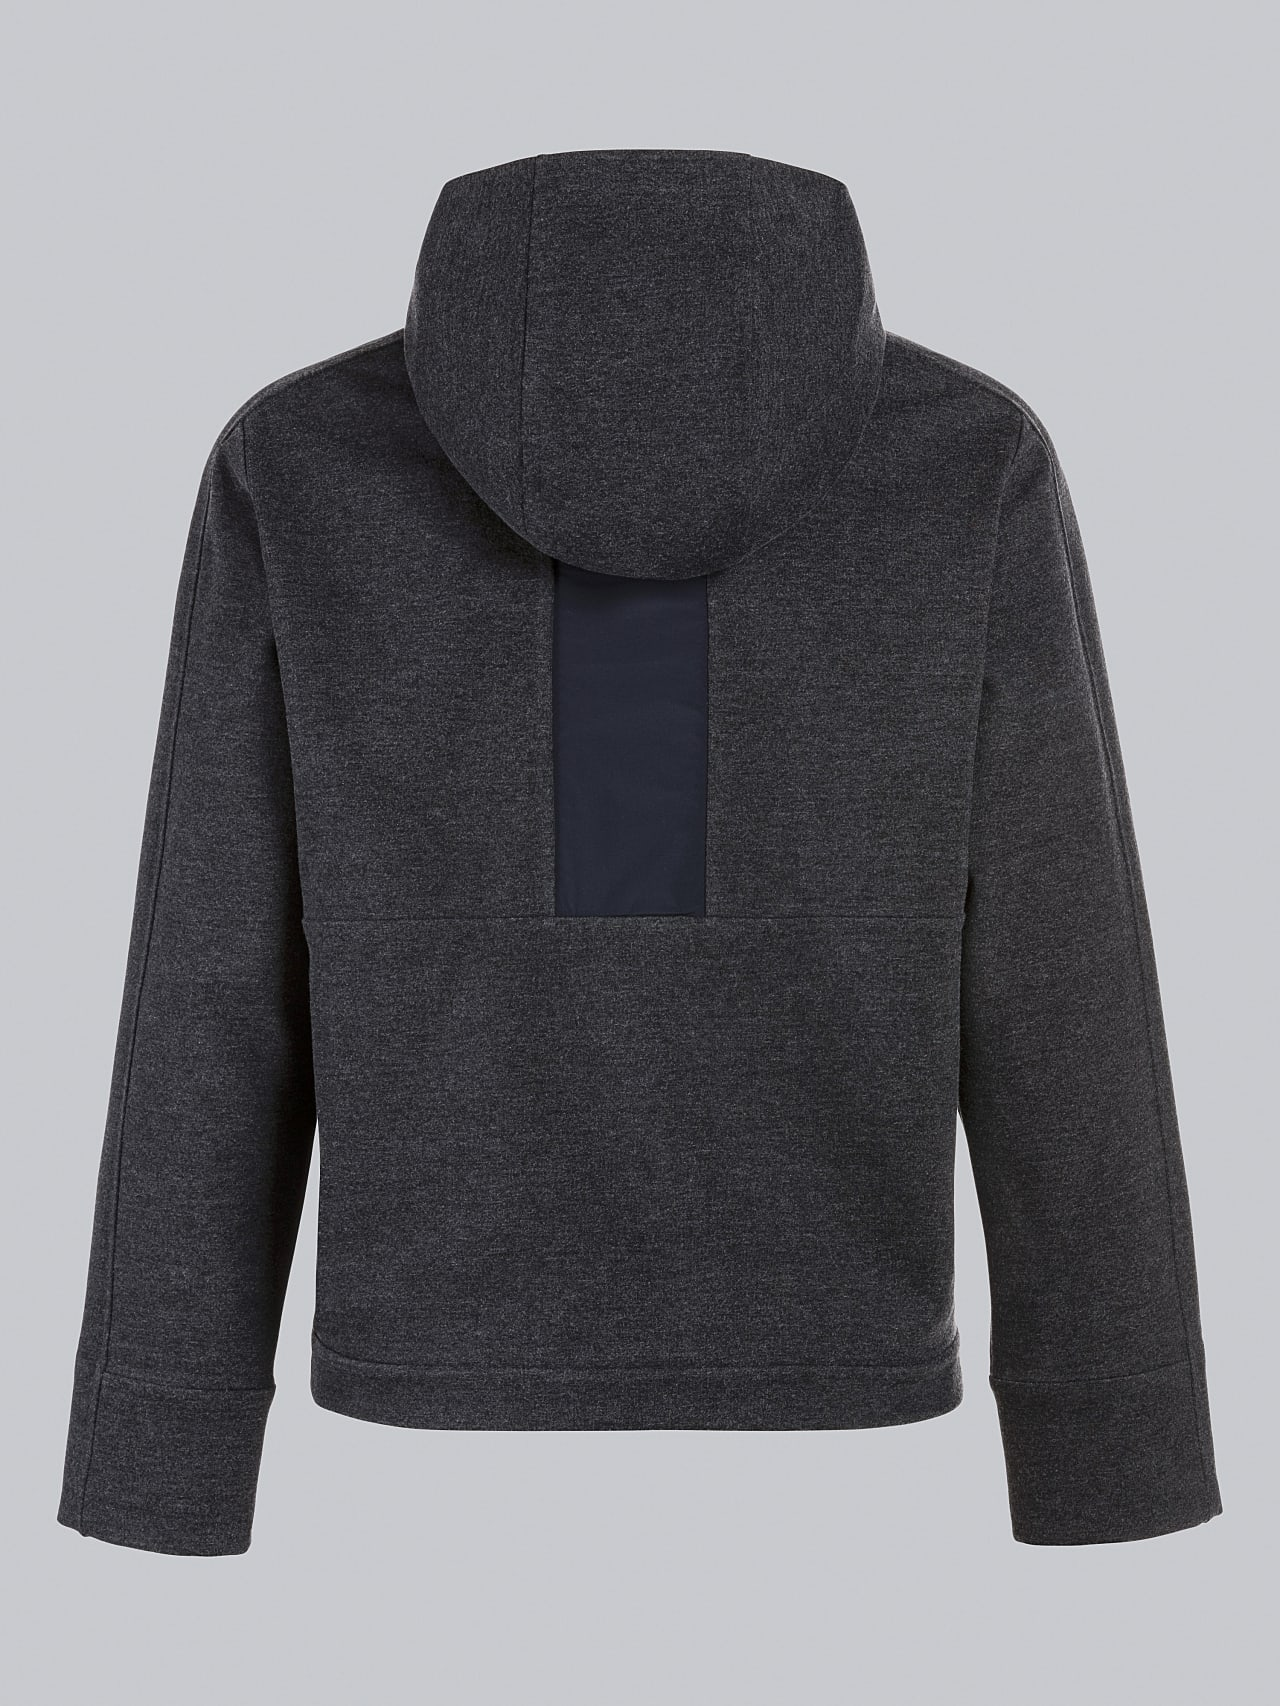 SINNO V2.Y5.02 Waterproof Hooded Jacket dark grey / anthracite Left Alpha Tauri